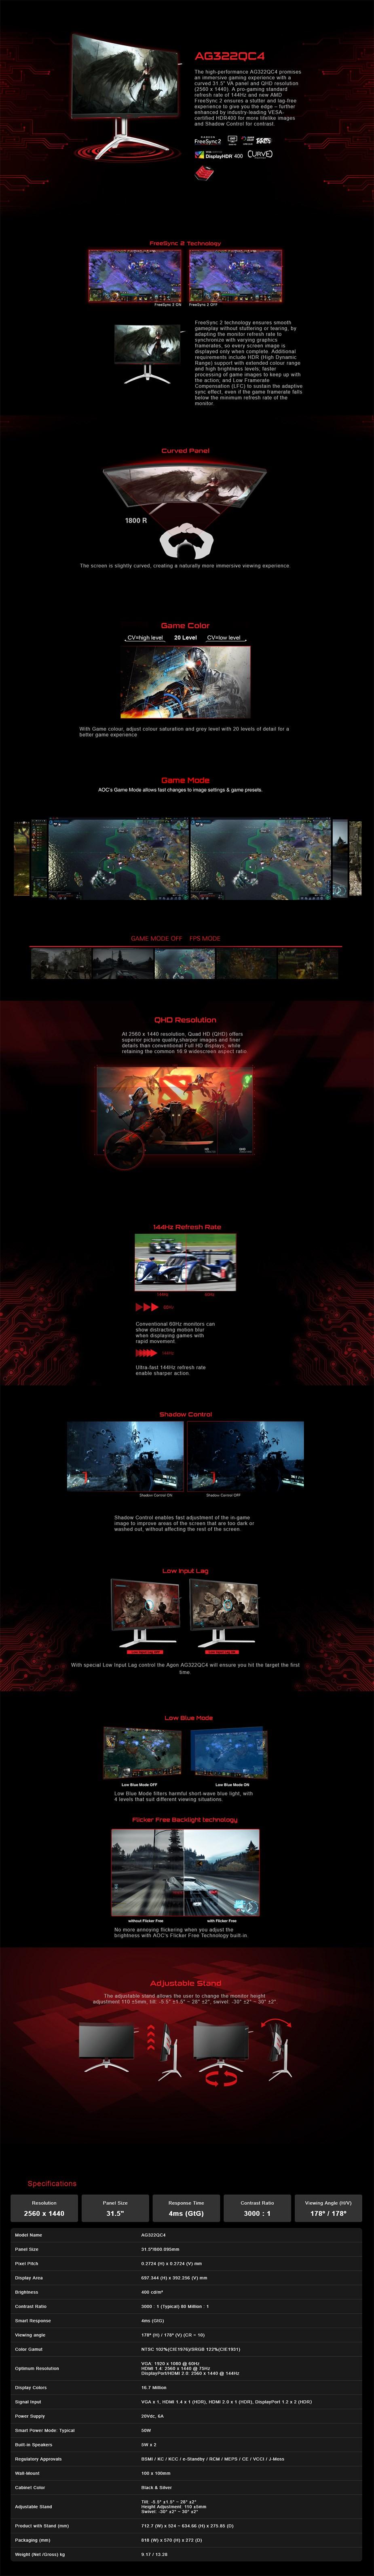 "AOC AGON AG322QC4 31.5"" 144Hz QHD VA FreeSync Gaming Monitor - Desktop Overview 1"